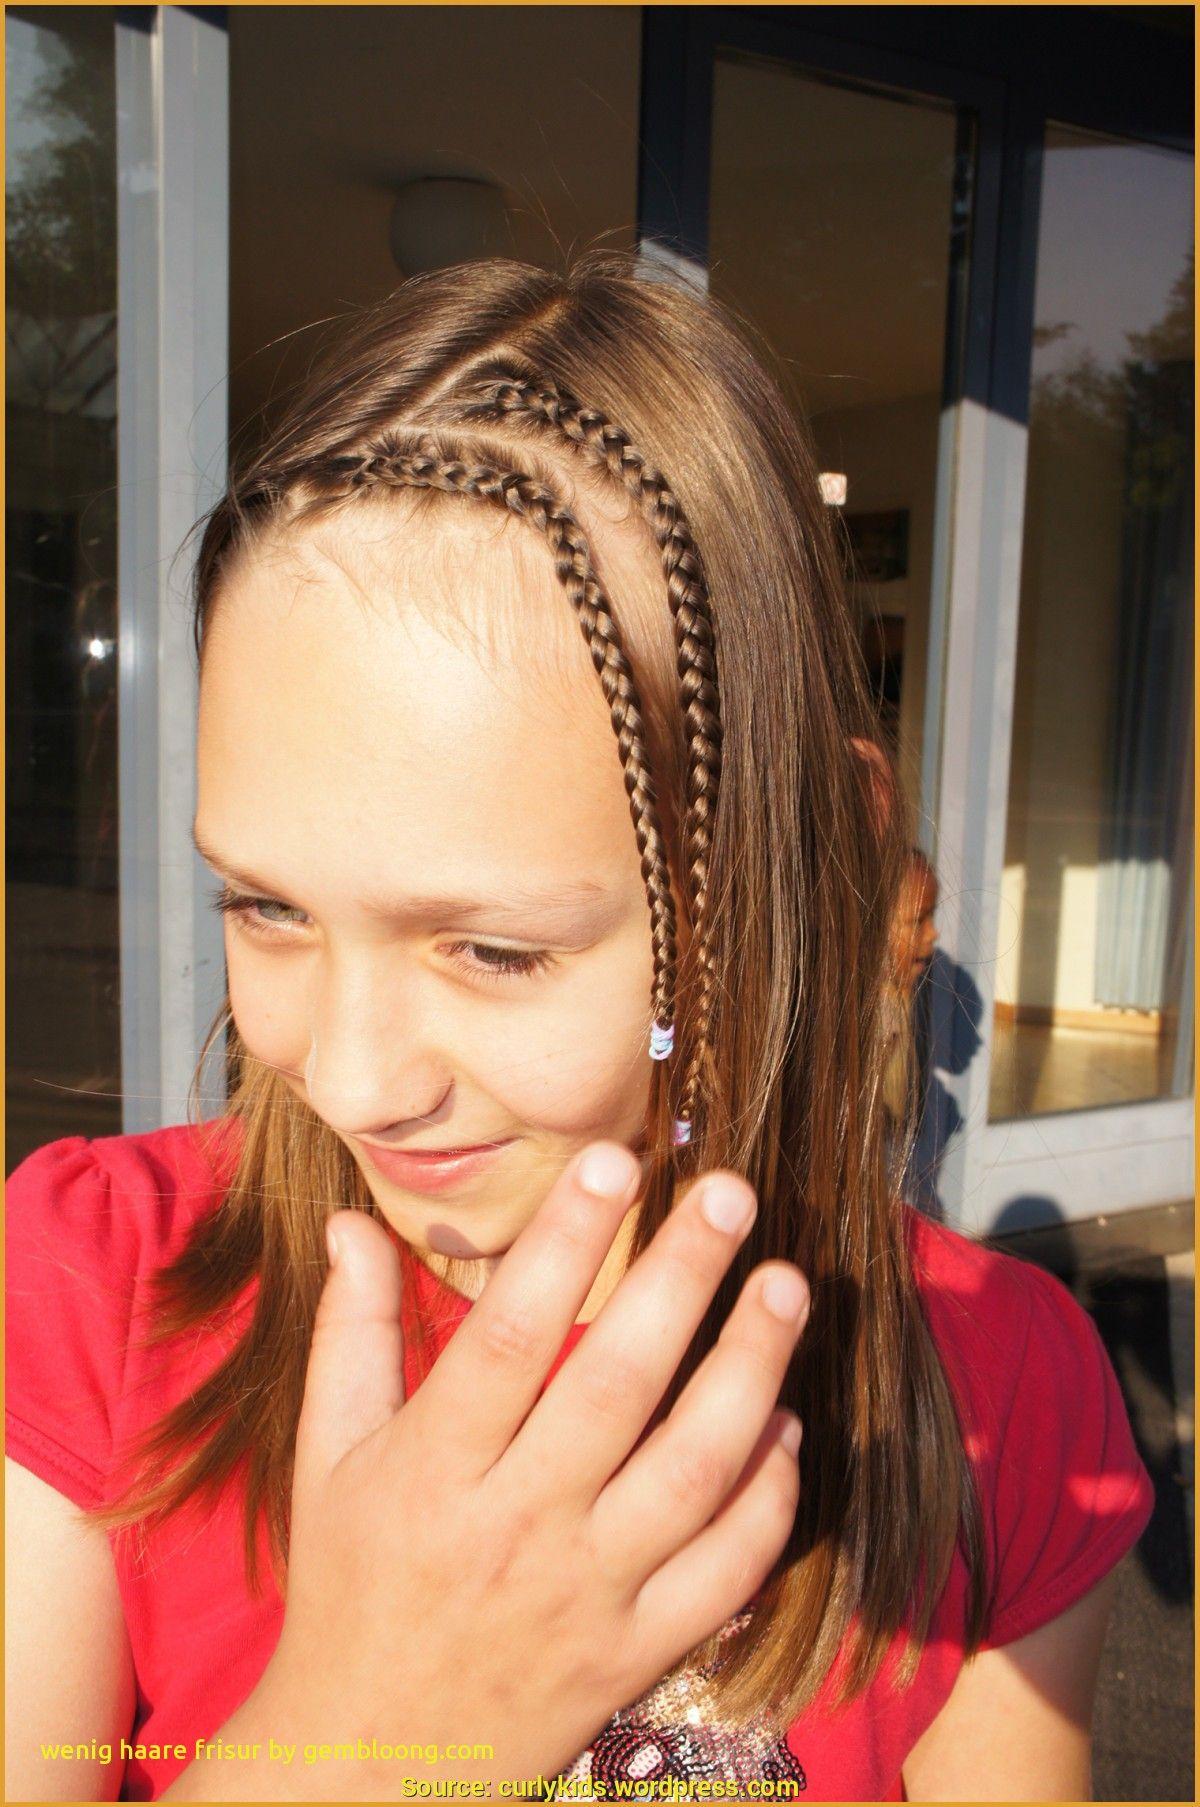 Frisuren Damen Wenig Haare Frisuren Frauen Pinterest Frisuren